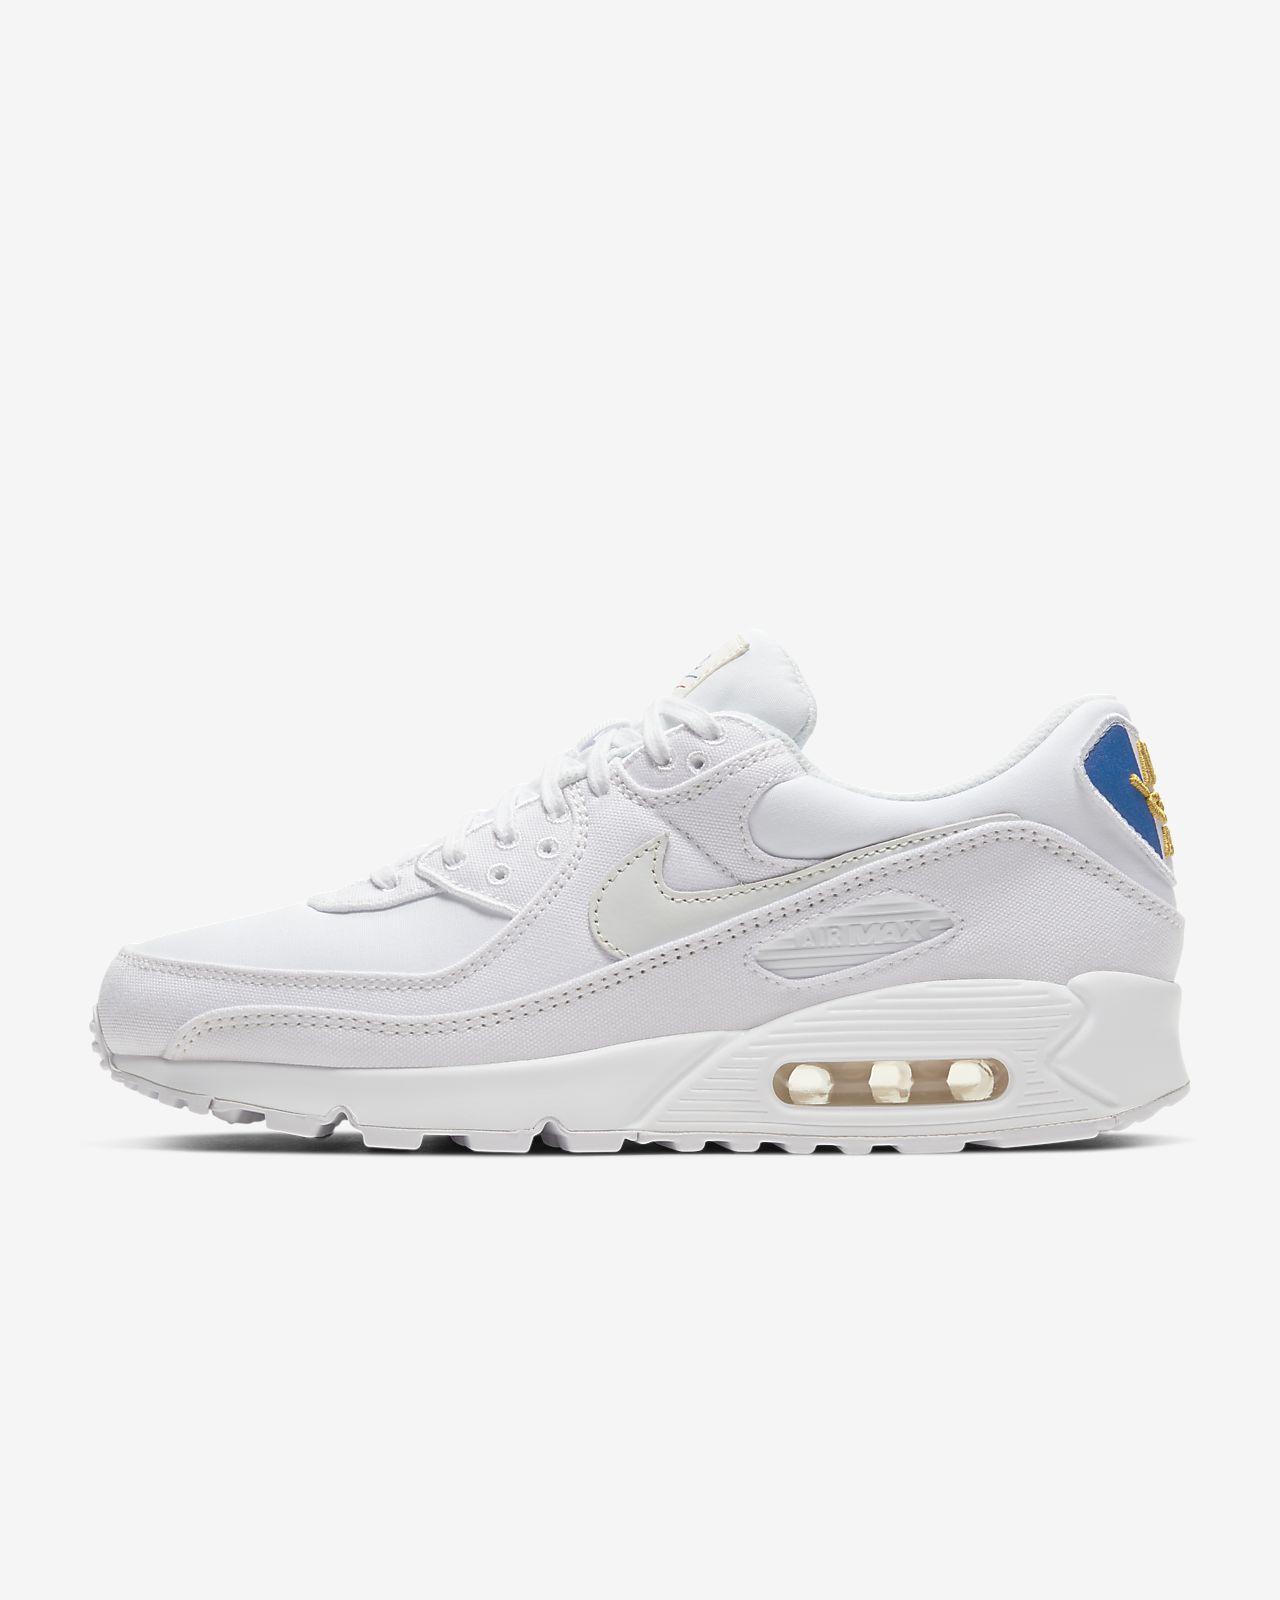 Sapatilhas Nike Air Max 90 Premium